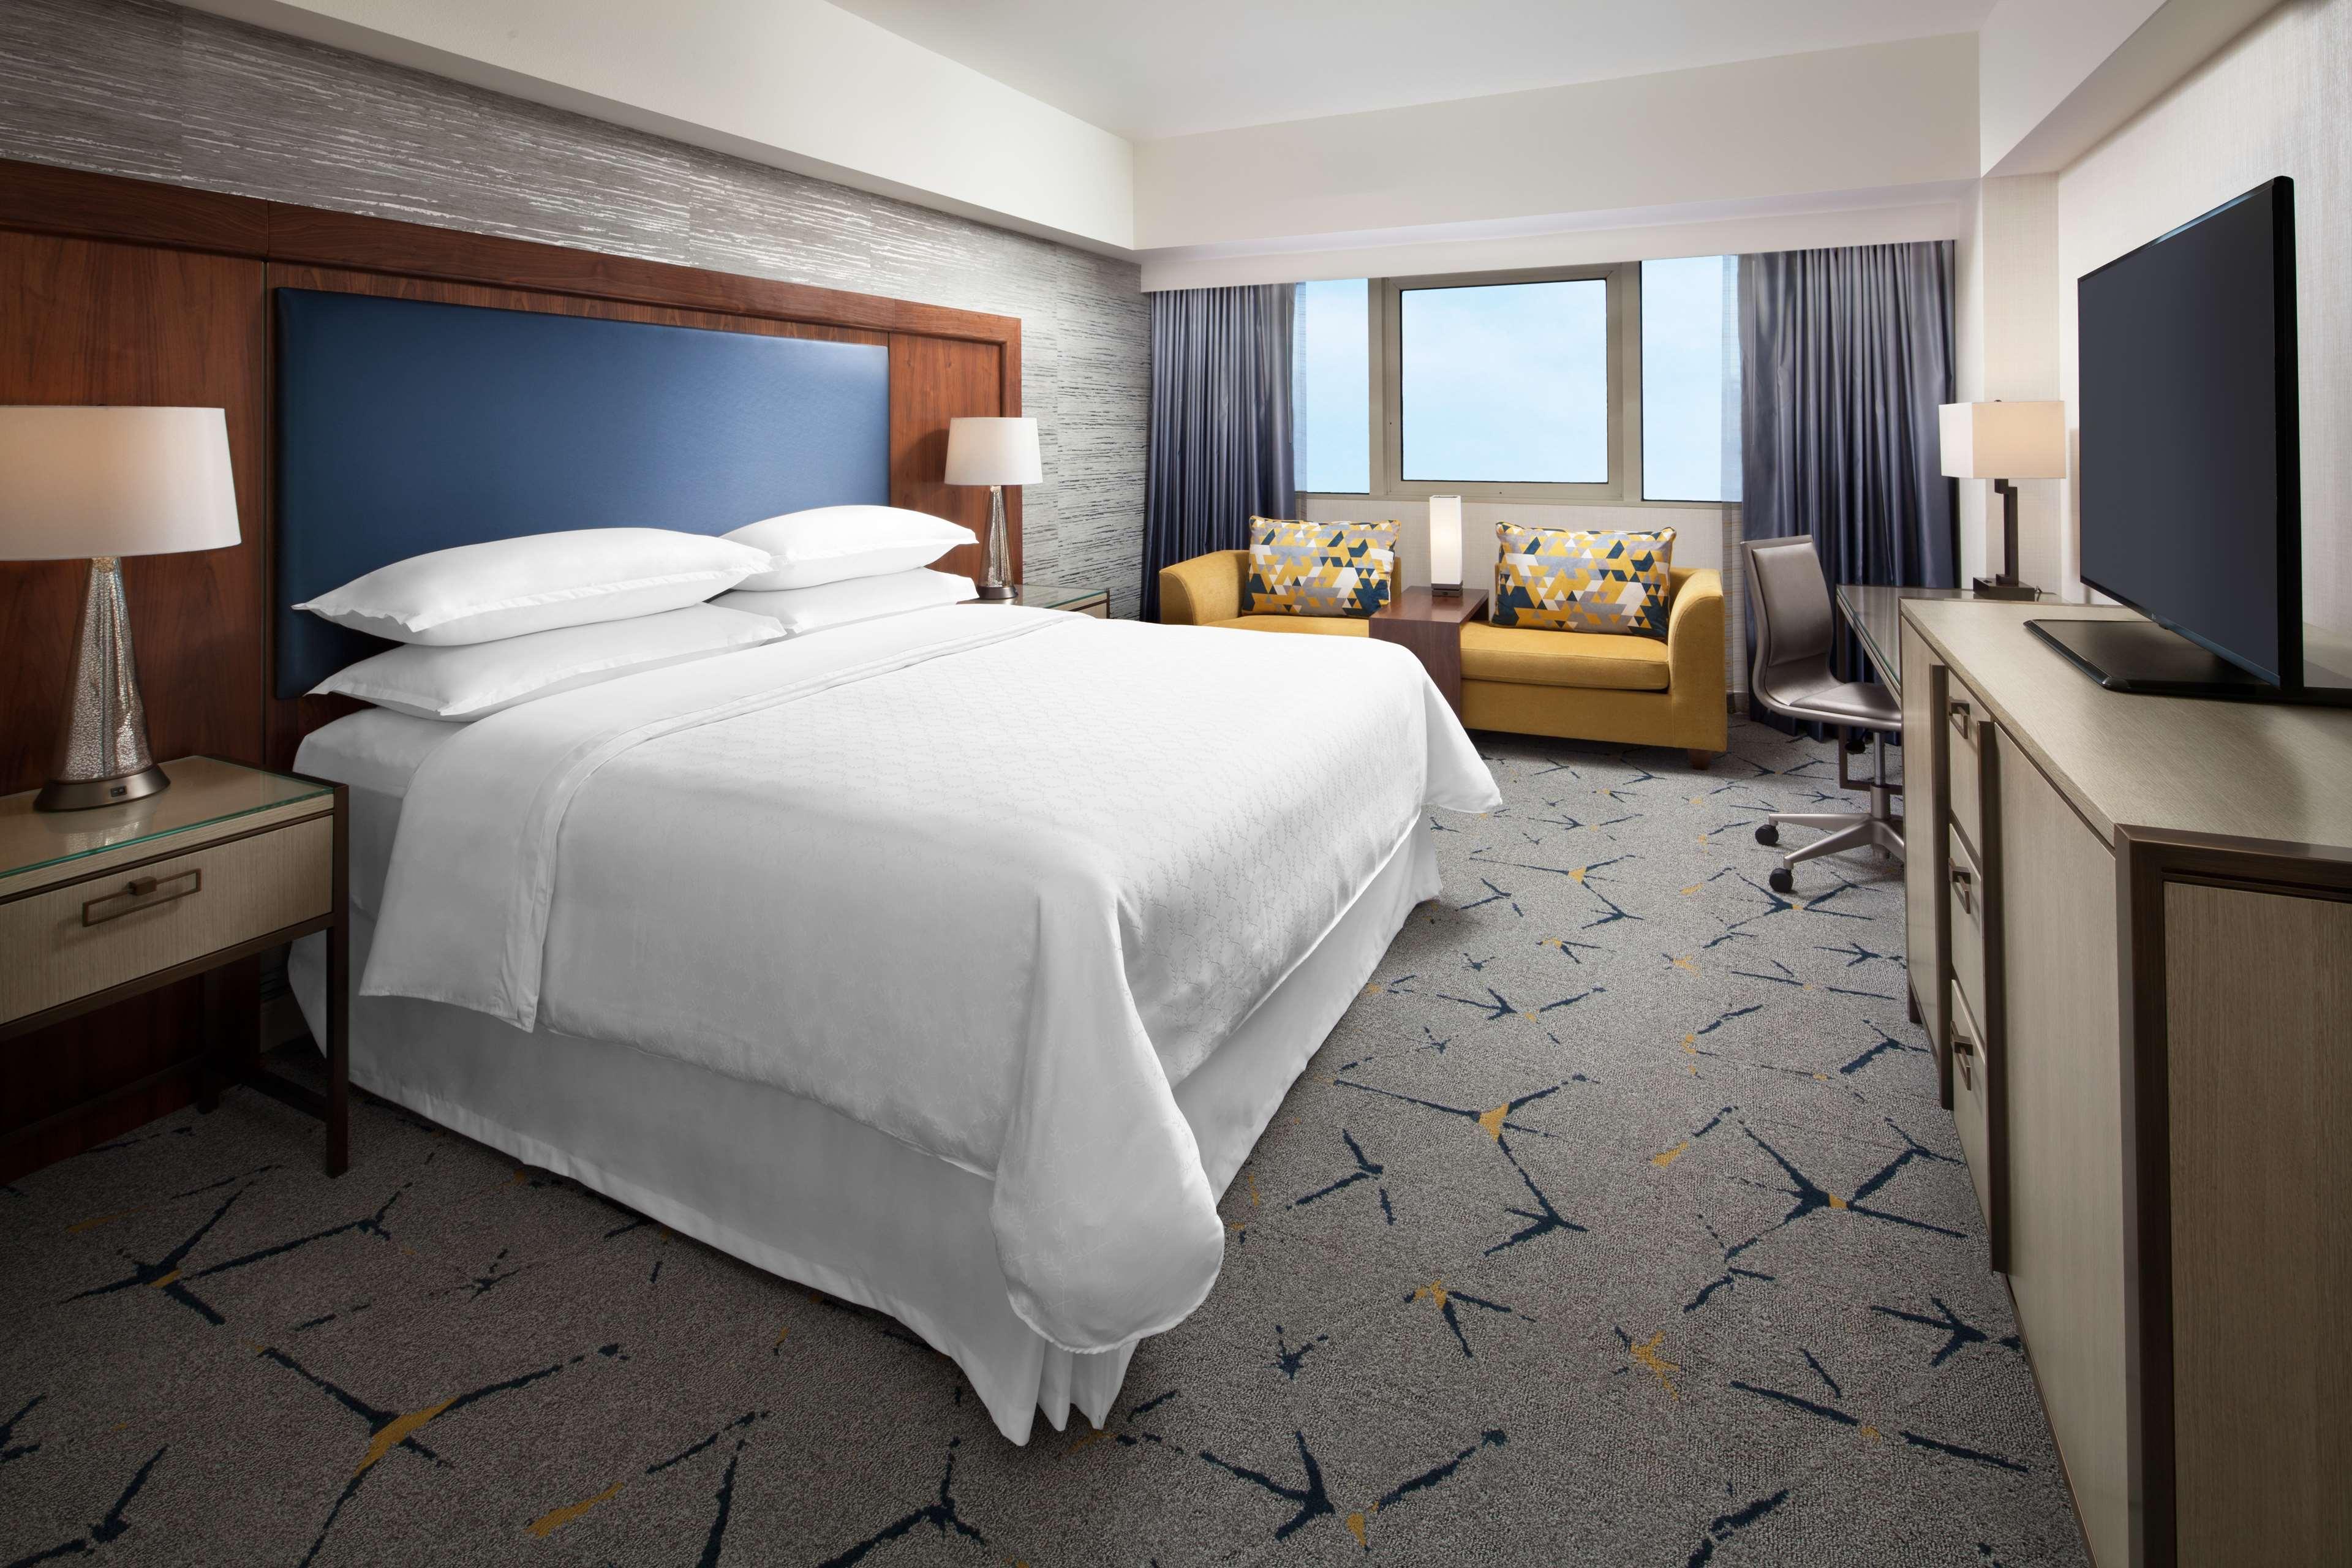 Sheraton Gateway Los Angeles Hotel image 11